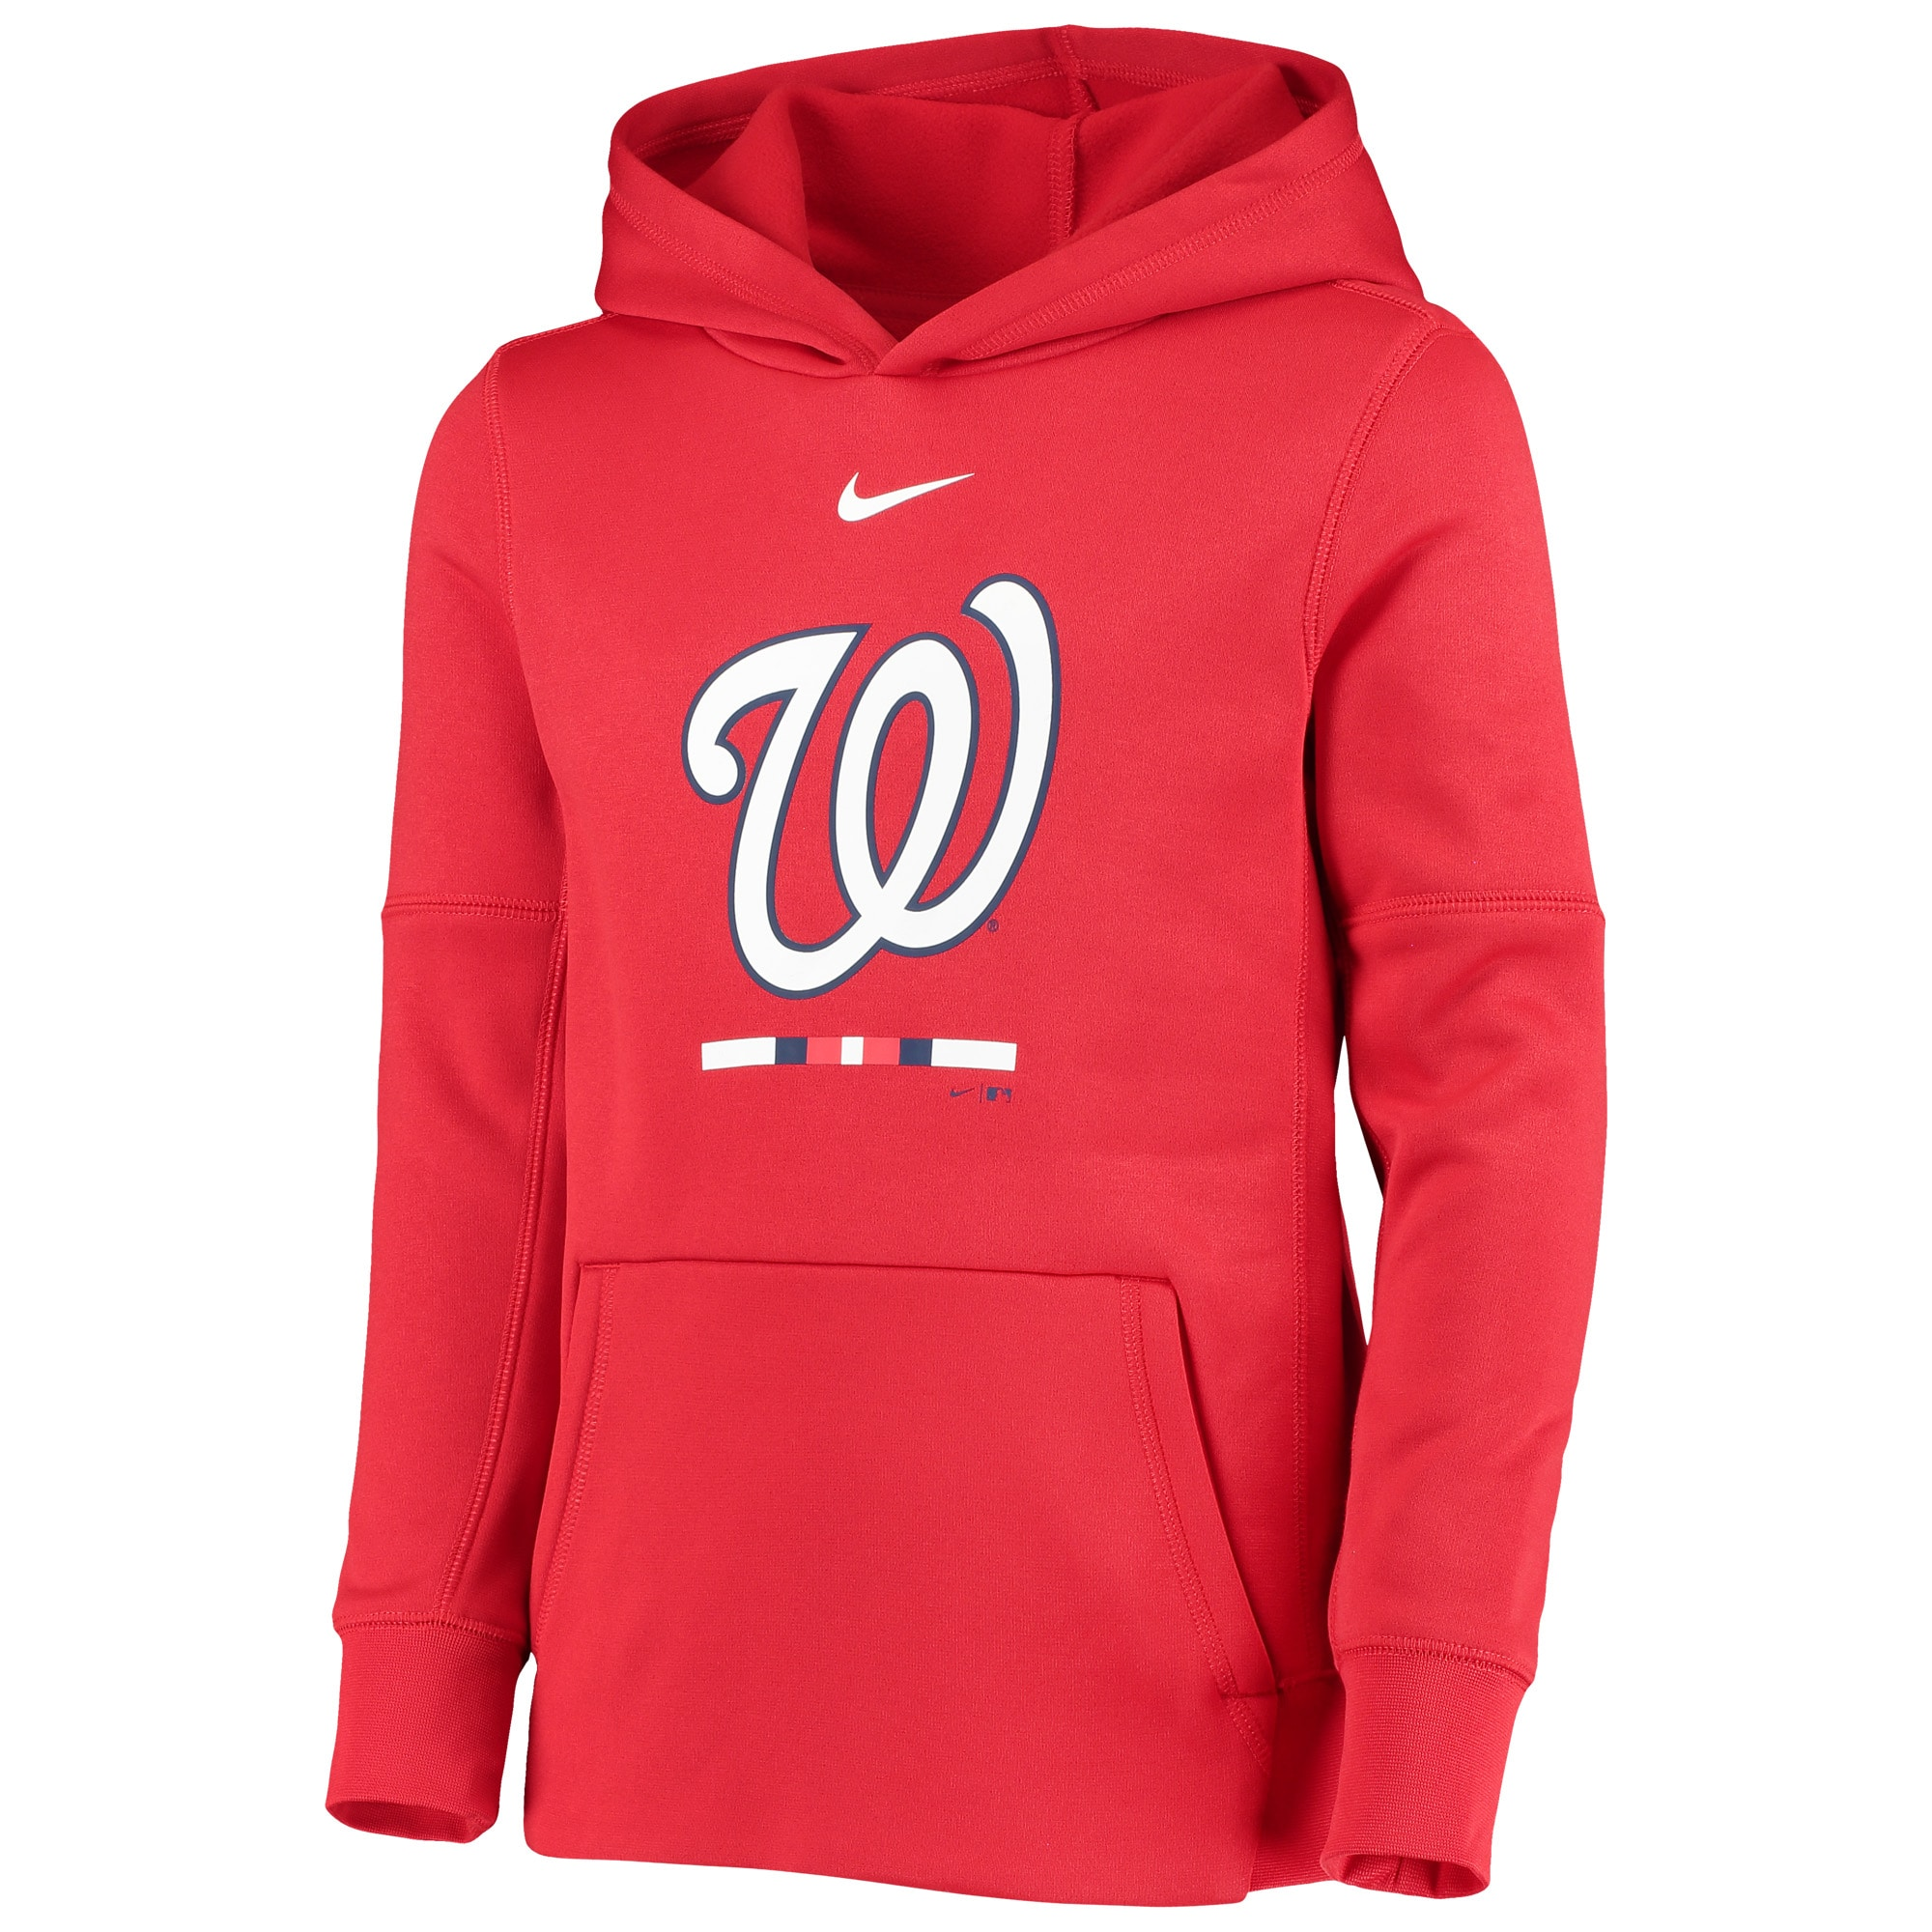 Hooded Sweatshirt Men Funny Pullover Fleece Hoodie Born in Washington